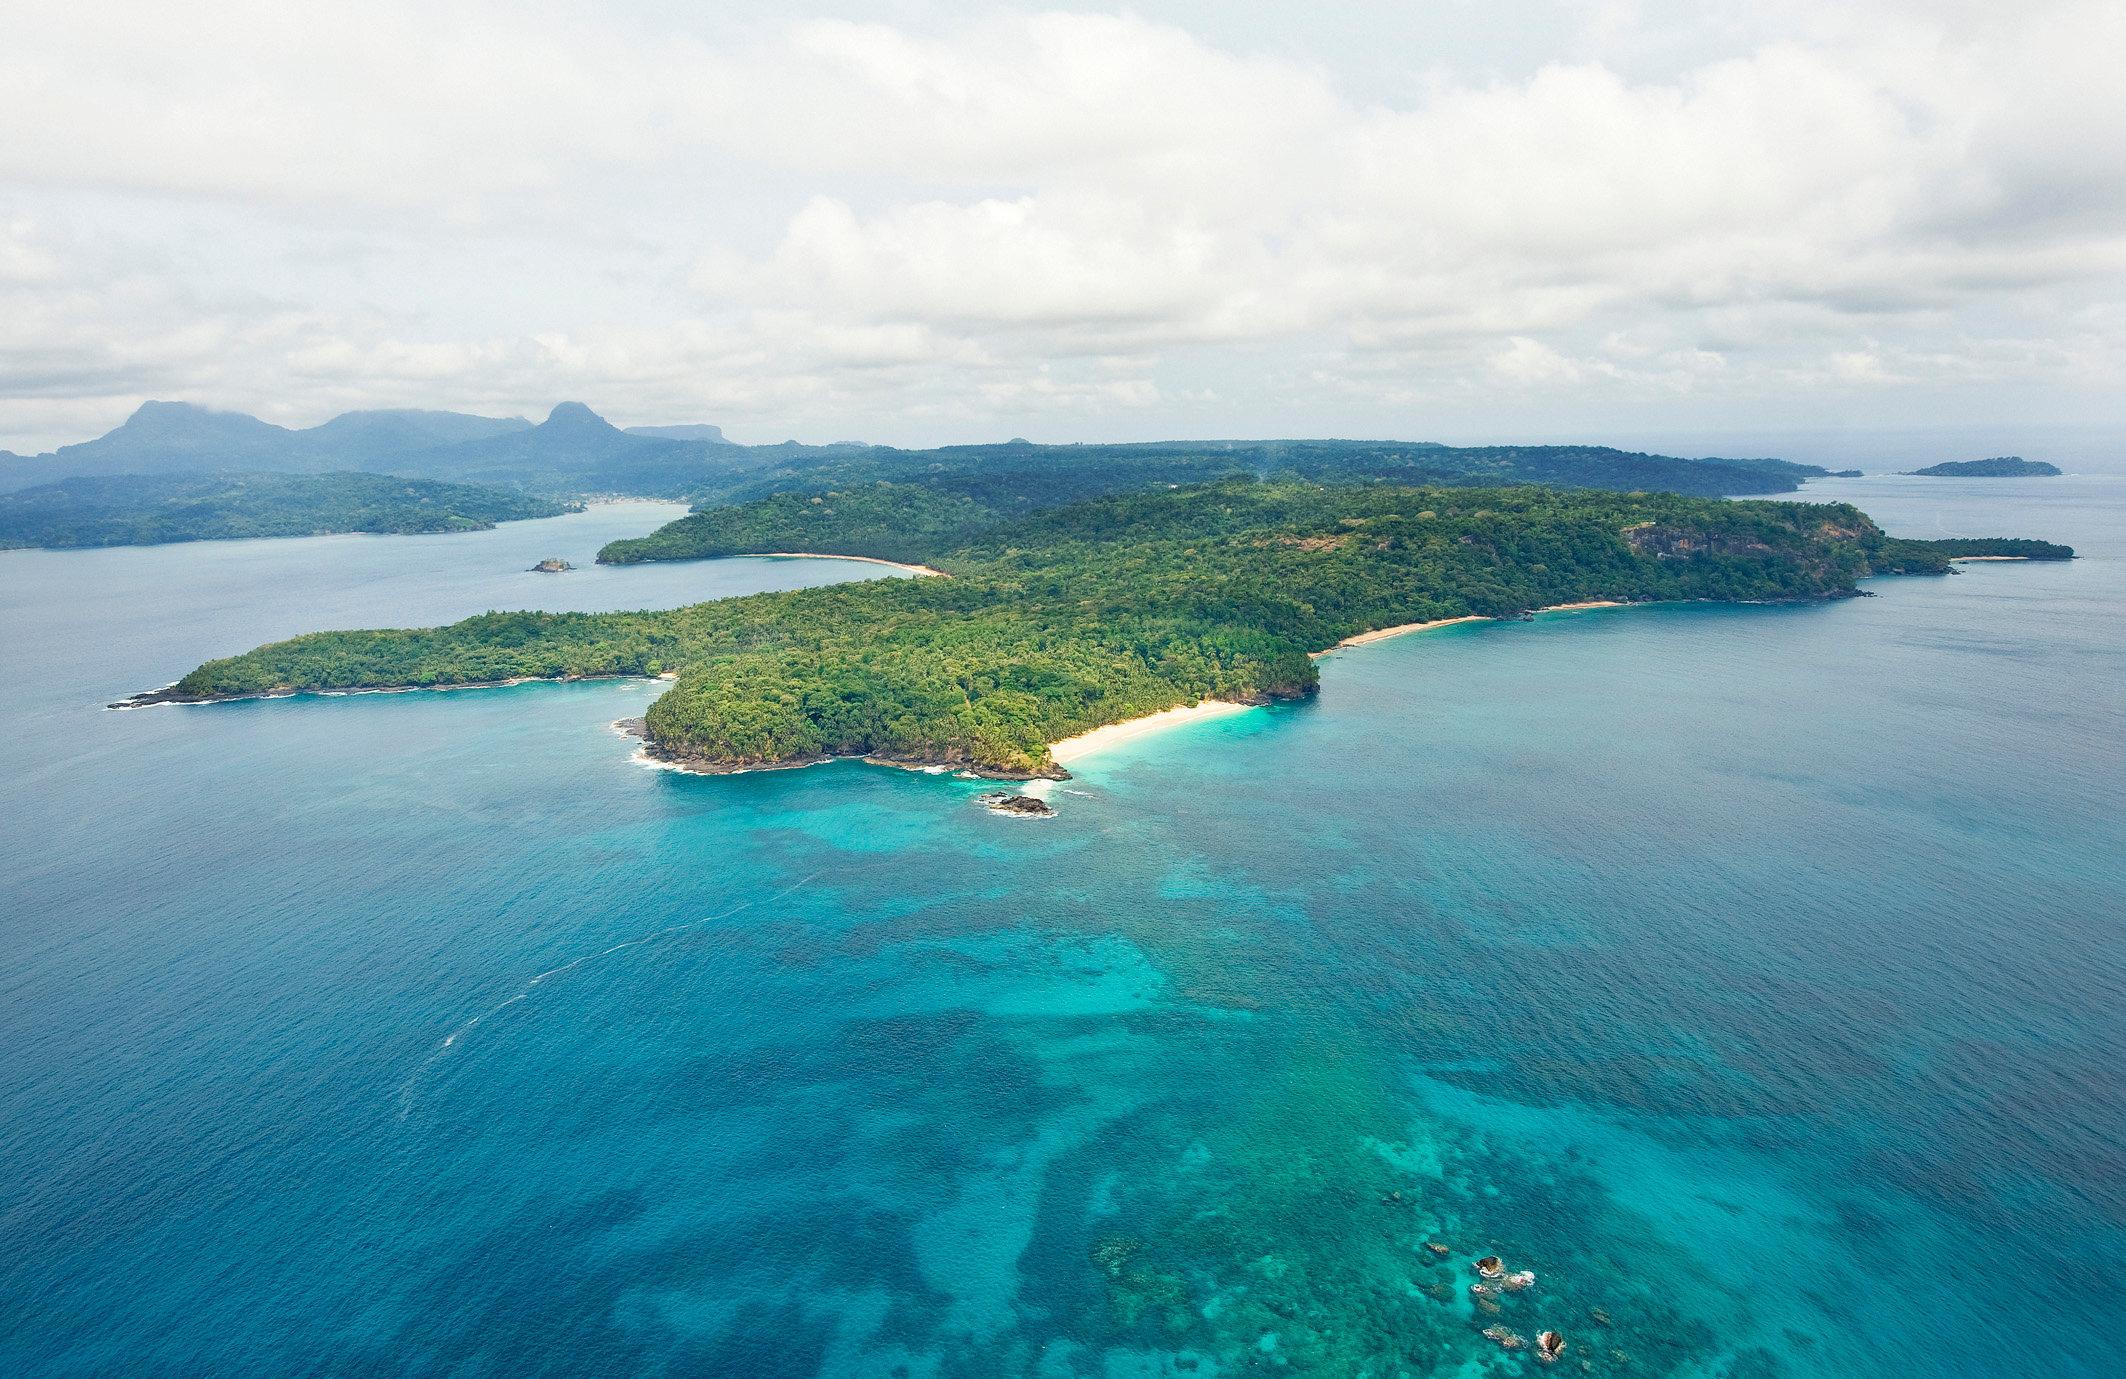 Isle of Principe, Africa.